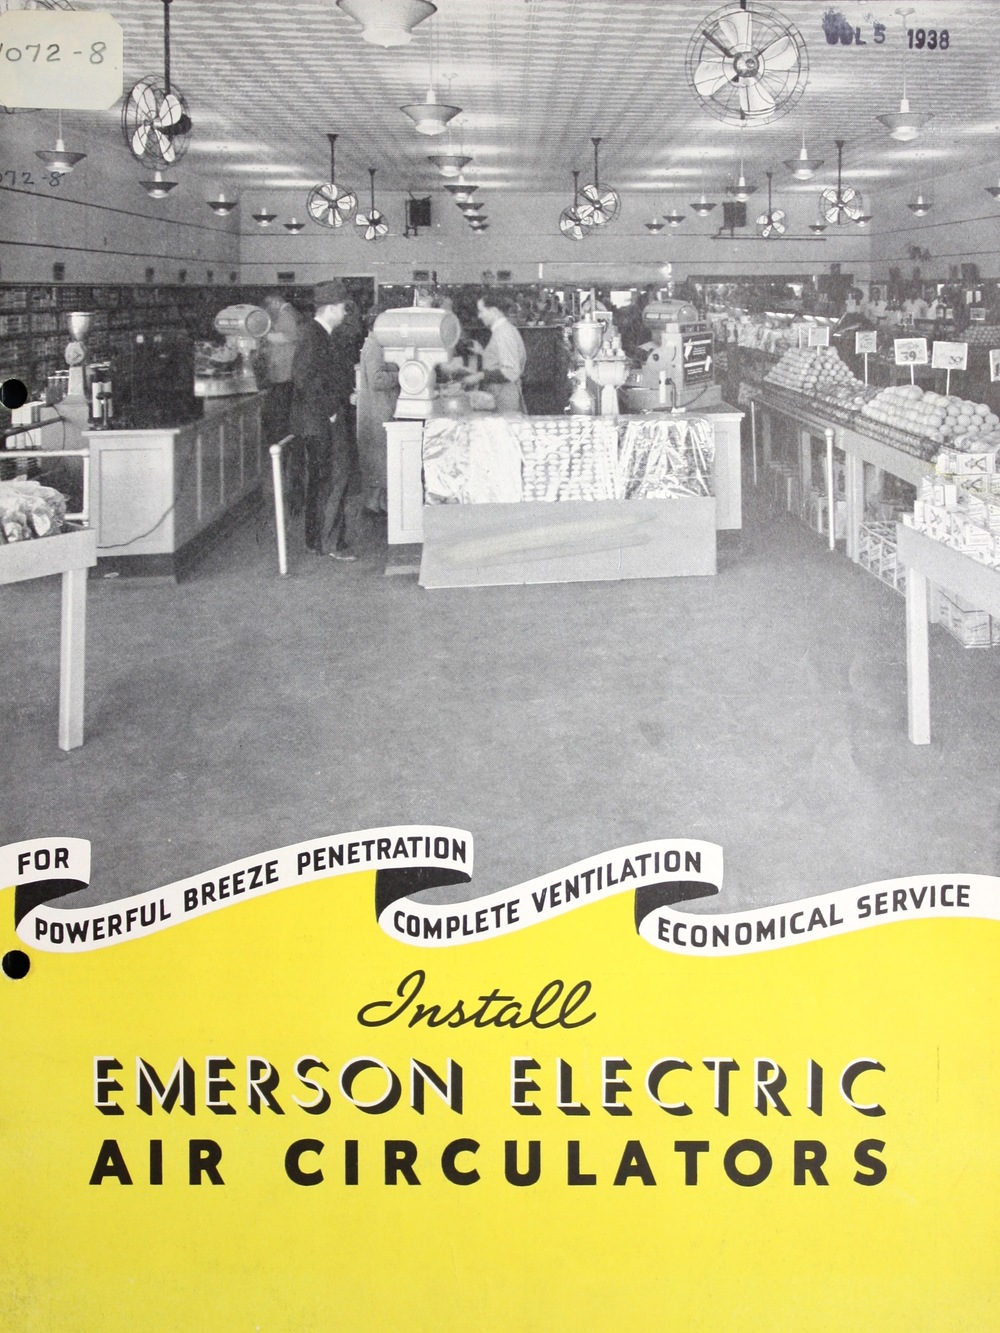 EmersonElectricMfgCoCca42784_0000.jpg